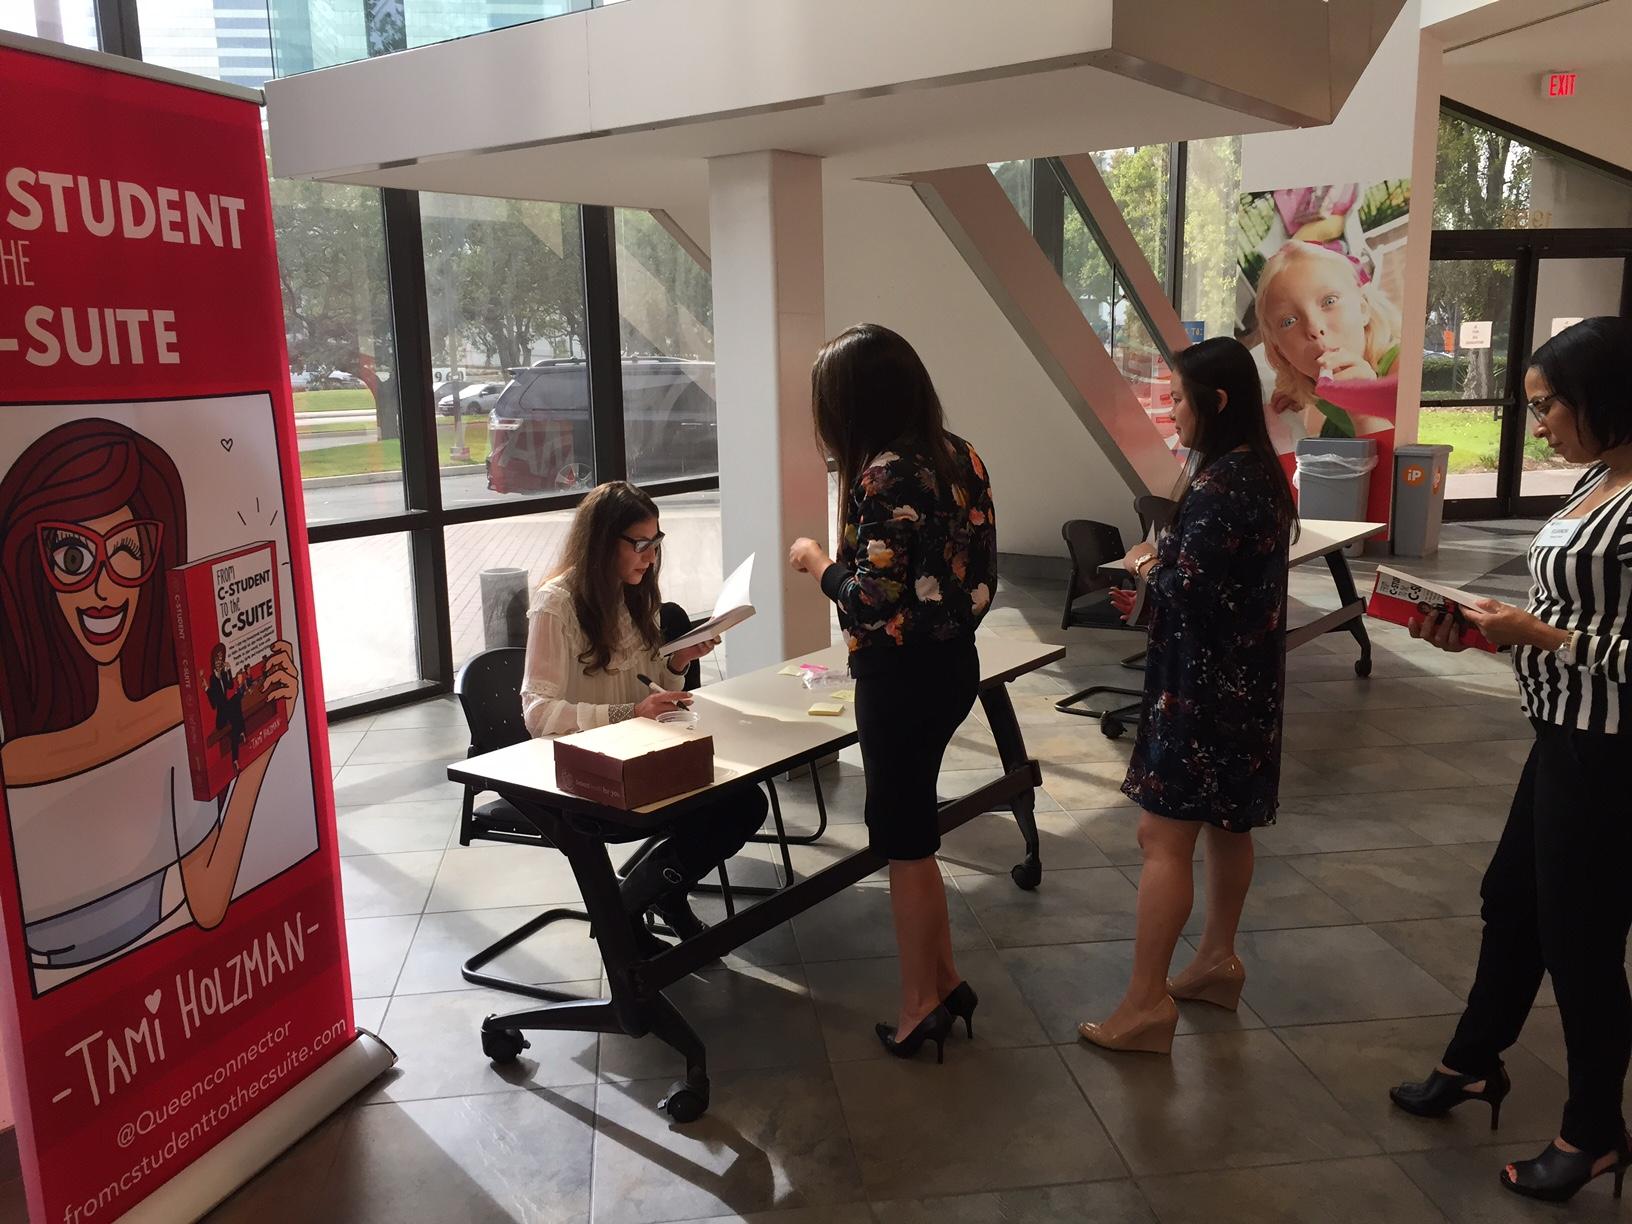 #TamiHolzman Tami Holzman #Keynotespeaker, Keynote Speaker, #emotionalintellegence Emotional Intelligence, #eq #csuite C-Suite #sales Sales #Author #Writer #Speaker, Author, female empowerment, #Business Business #Press Press#mattel